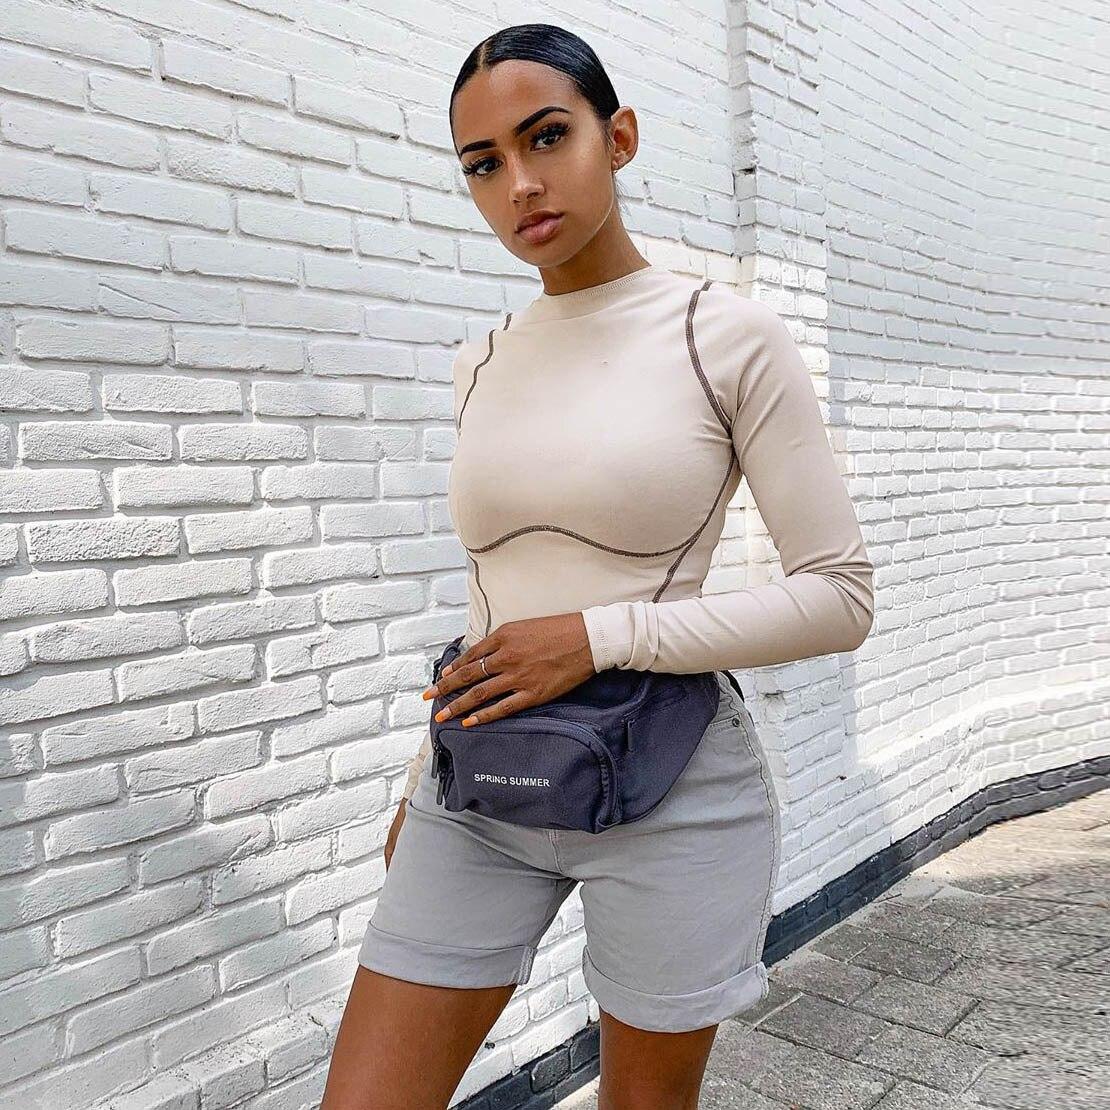 2020 Autumn Winter Women Bodysuit Long Sleeve Bodycon Sexy Romper Gloves Streetwear Festival Clothing One Piece Body